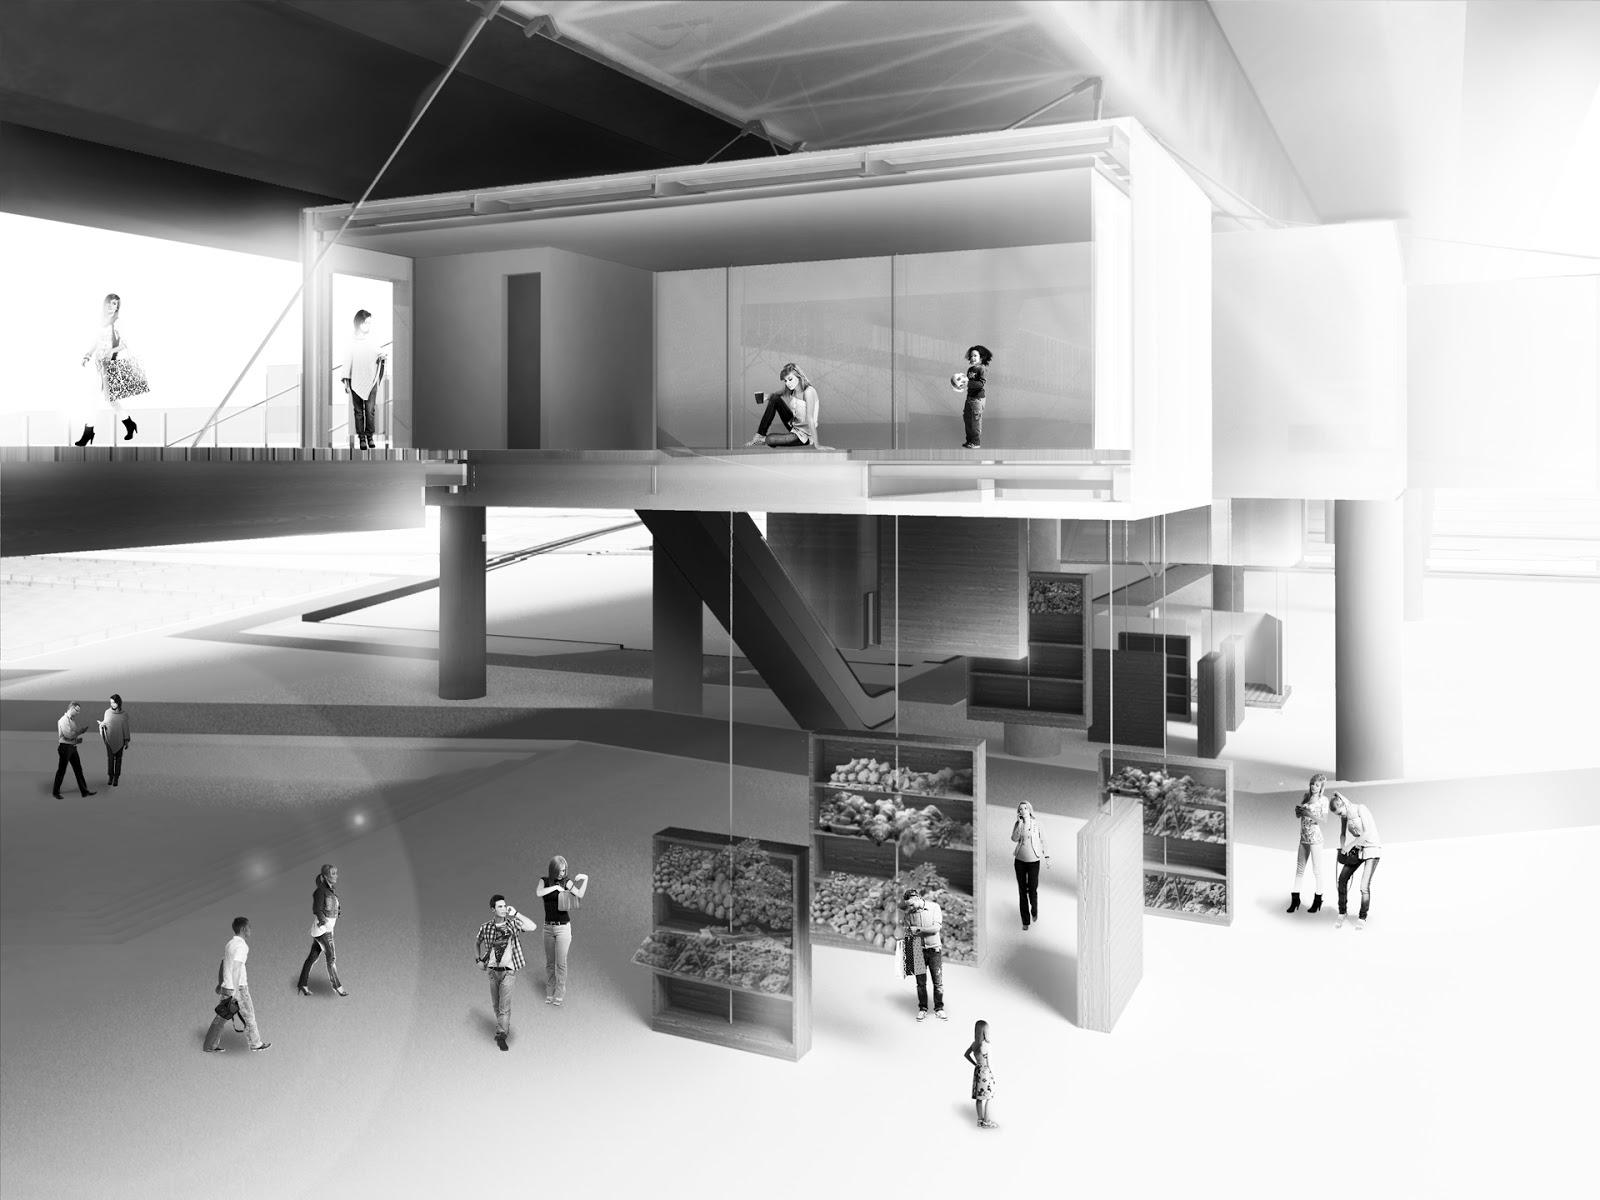 RENDERS 3D PFC - Fotomontaje 3D en Sección de una de las Tiendas para el PFC de un alumno de la UEM - ETSAM UEM UCJC ESAYT USPCEU USP CEU IE UAX UAH UPM ETSA